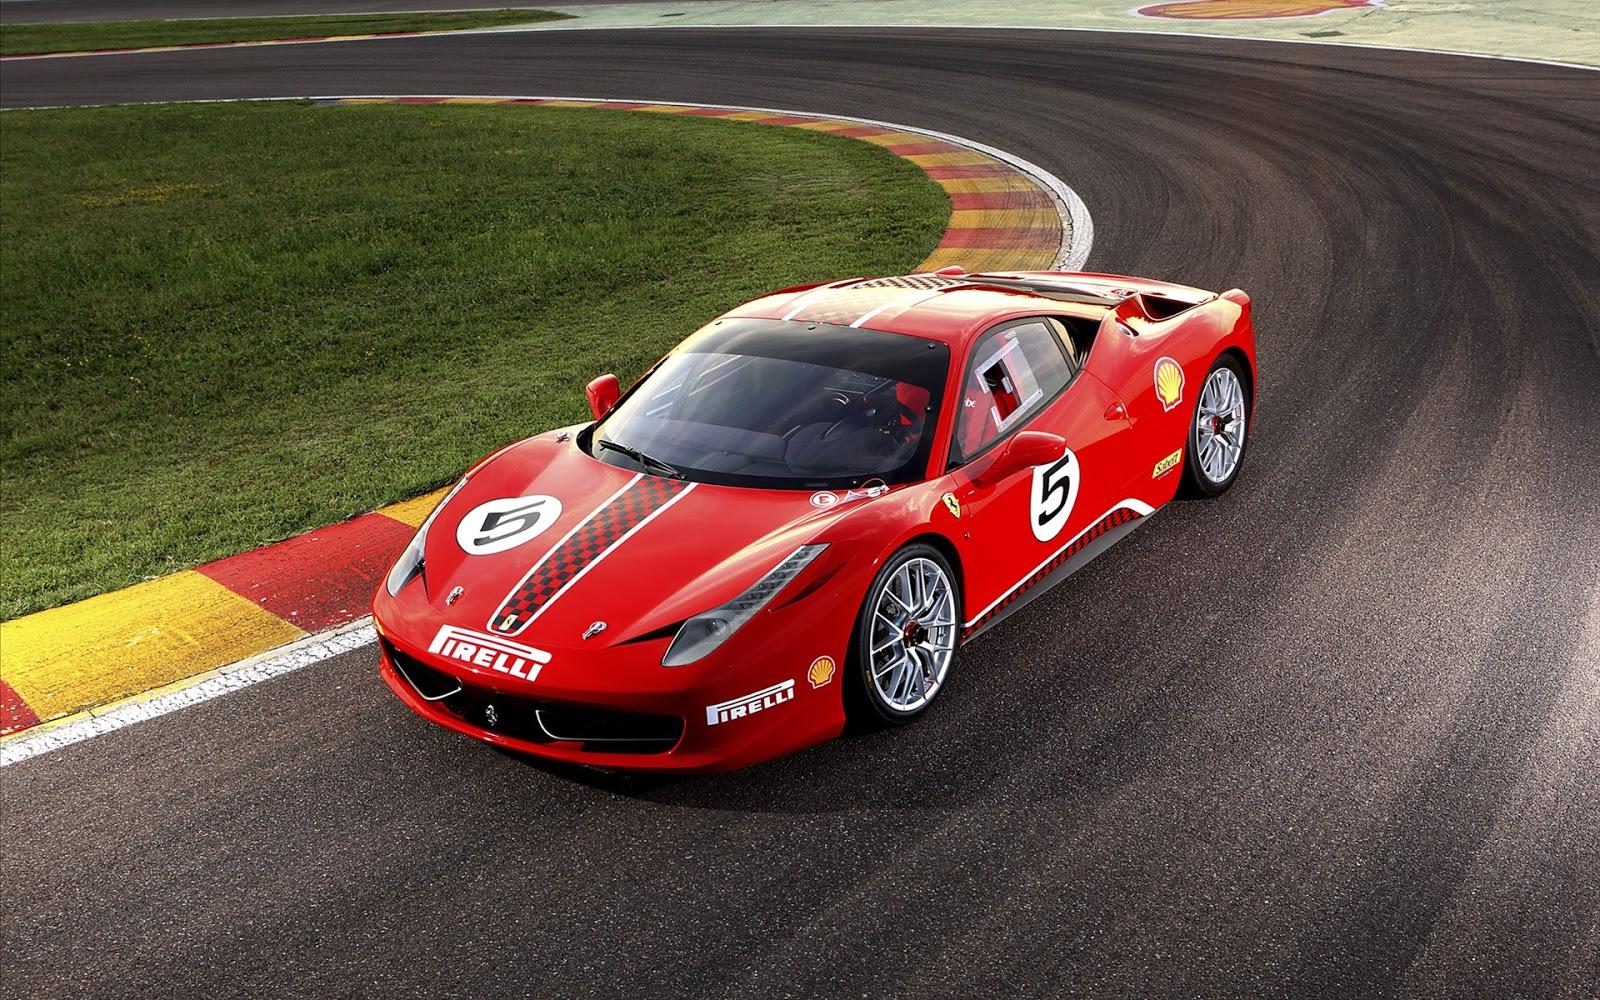 Ferrari 458 HD Wallpaper for iPhone